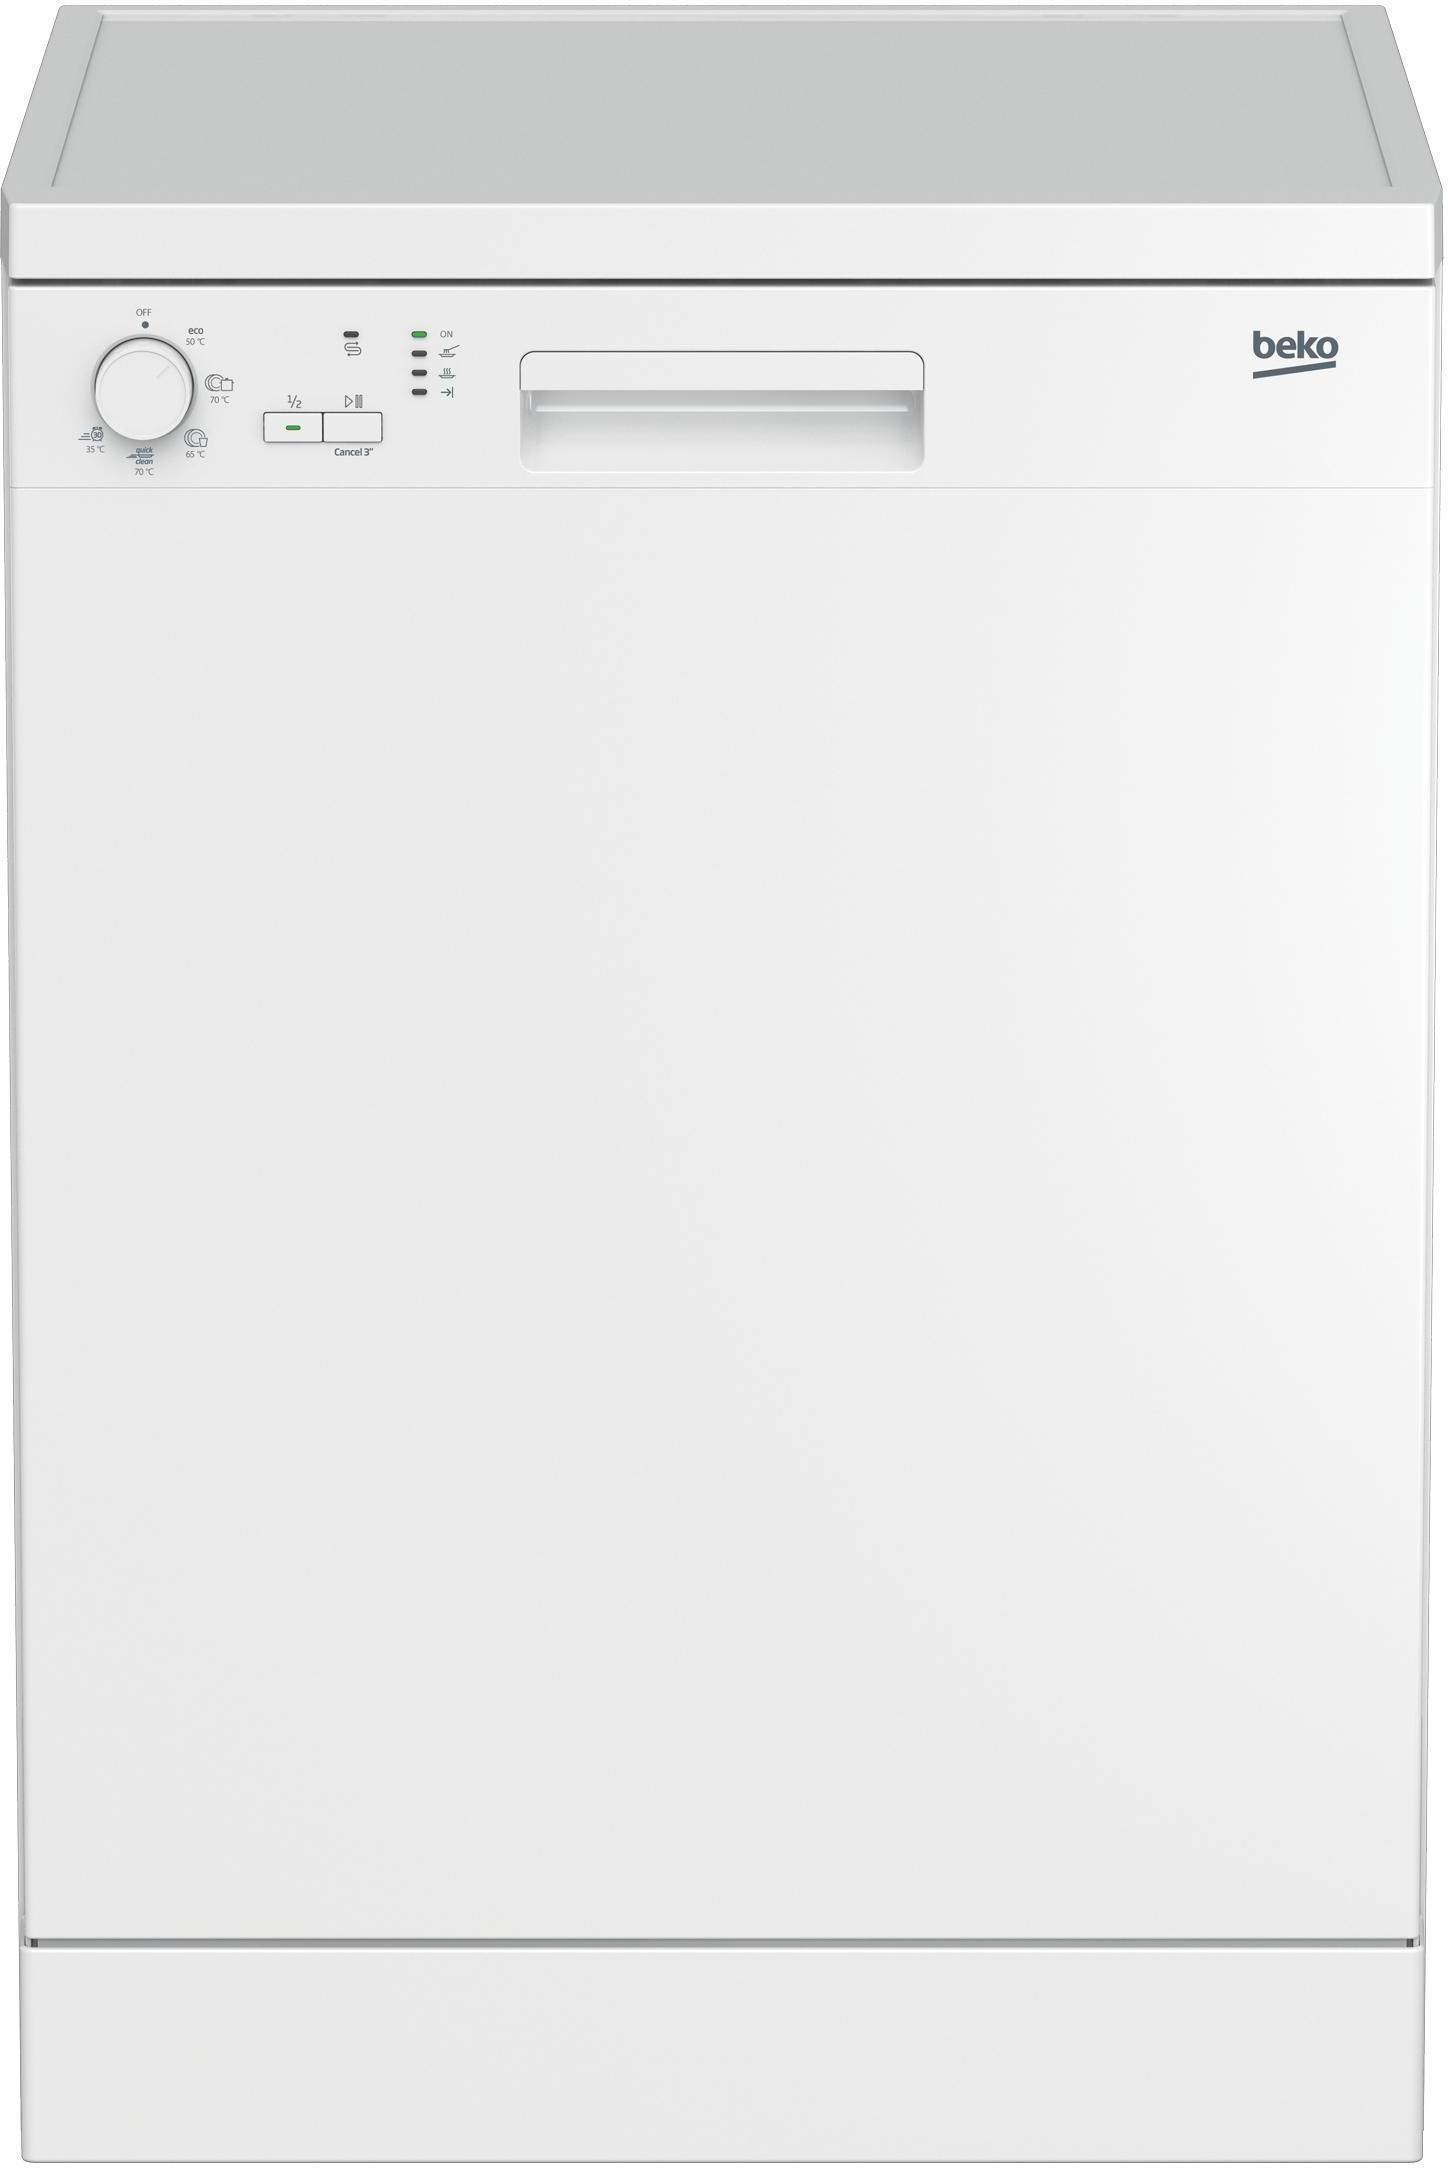 Beko-lavavajillas-DFN05210W-5p-1-2-carga-a